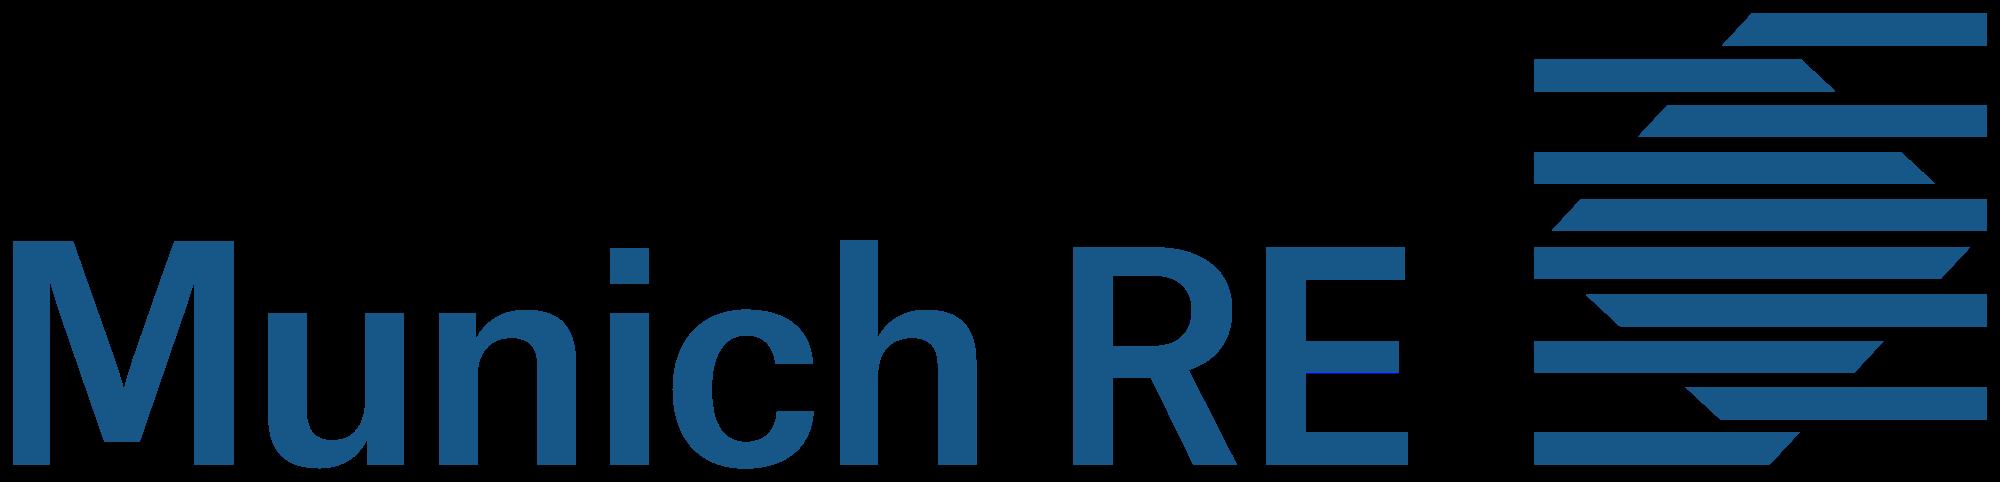 Münchener Rück Logo